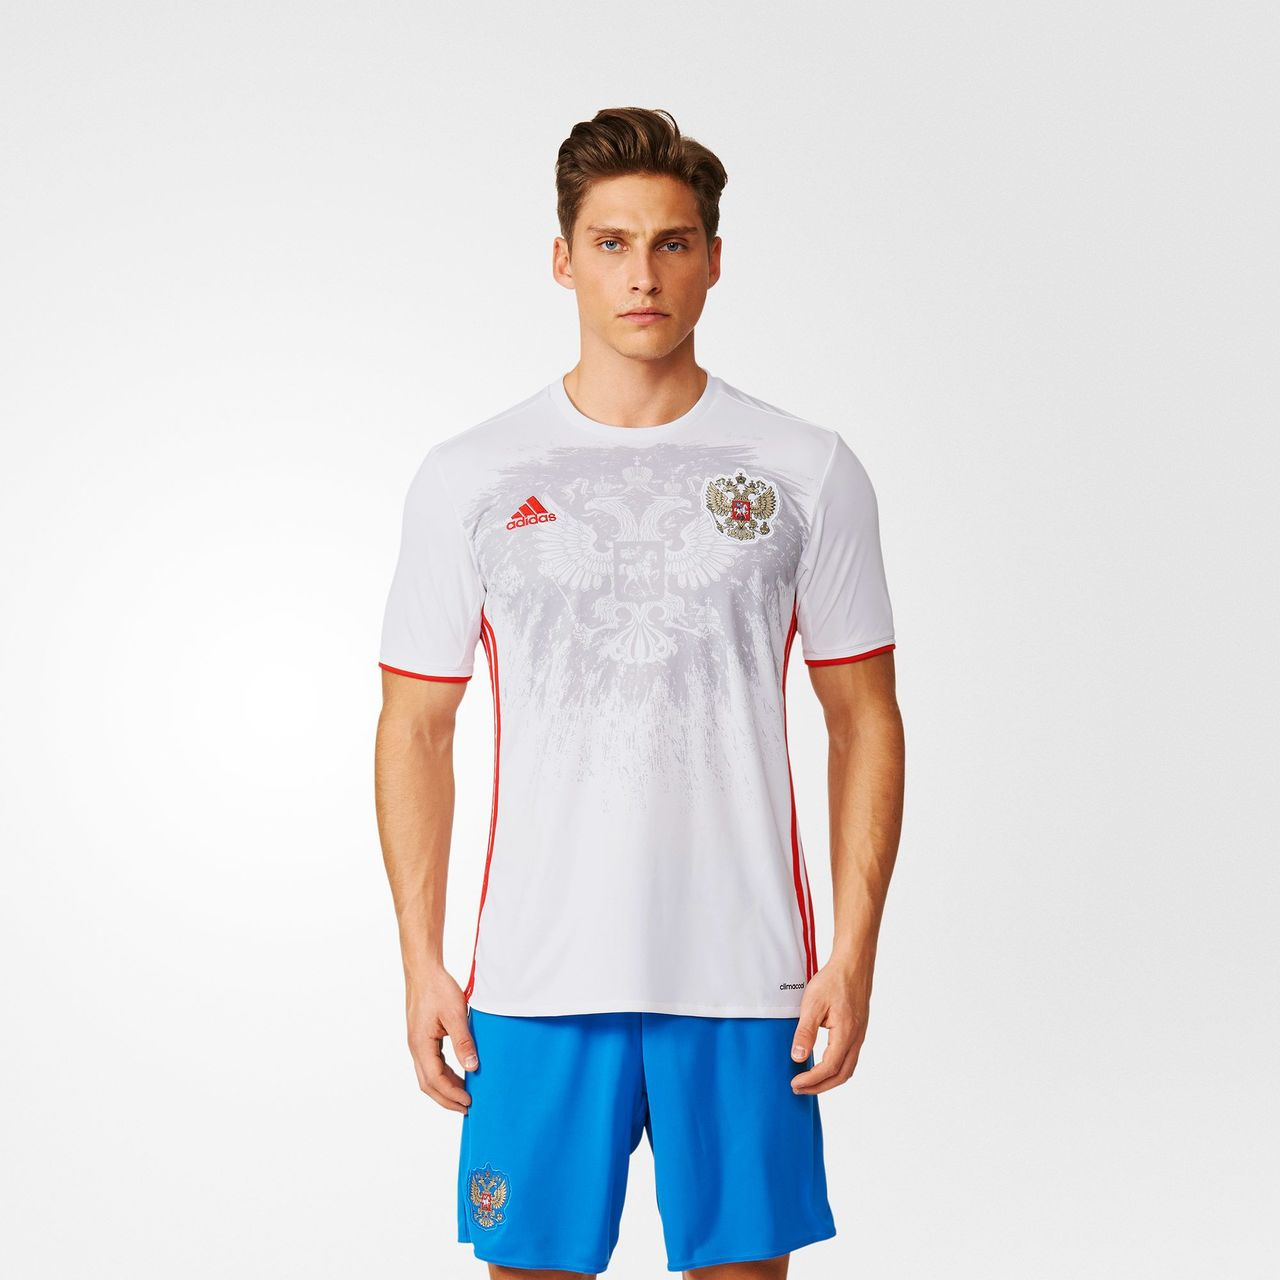 release date 51e5d f81a1 Russia Euro 2016 Adidas Away Kit   15/16 Kits   Football ...